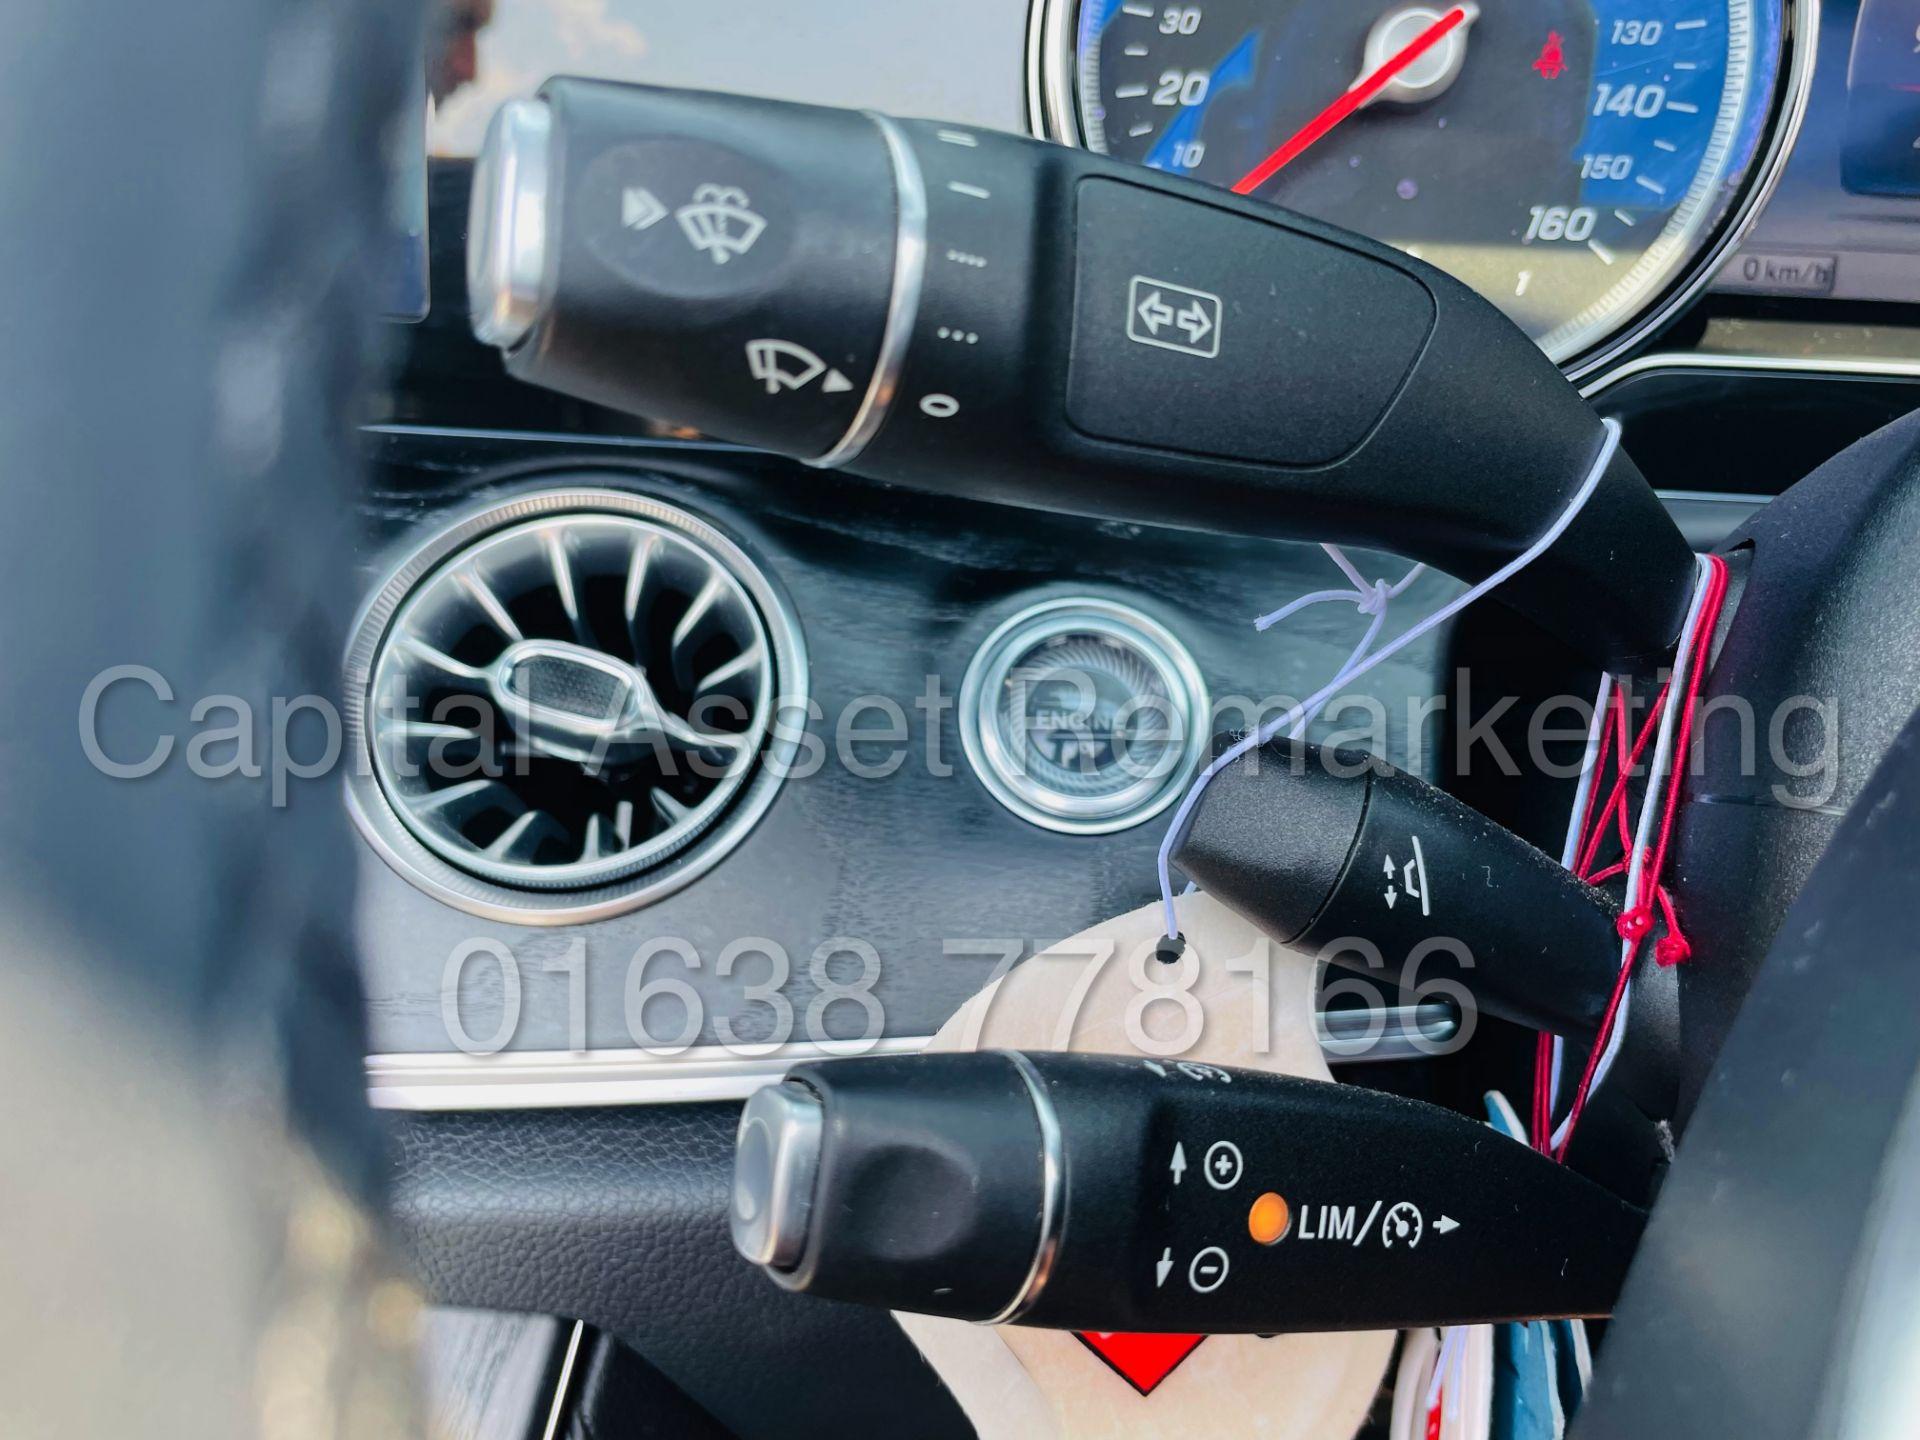 MERCEDES-BENZ E220d *AMG LINE PREMIUM - CABRIOLET* (2018 - EURO 6) '9G AUTO - LEATHER - SAT NAV' - Image 59 of 63